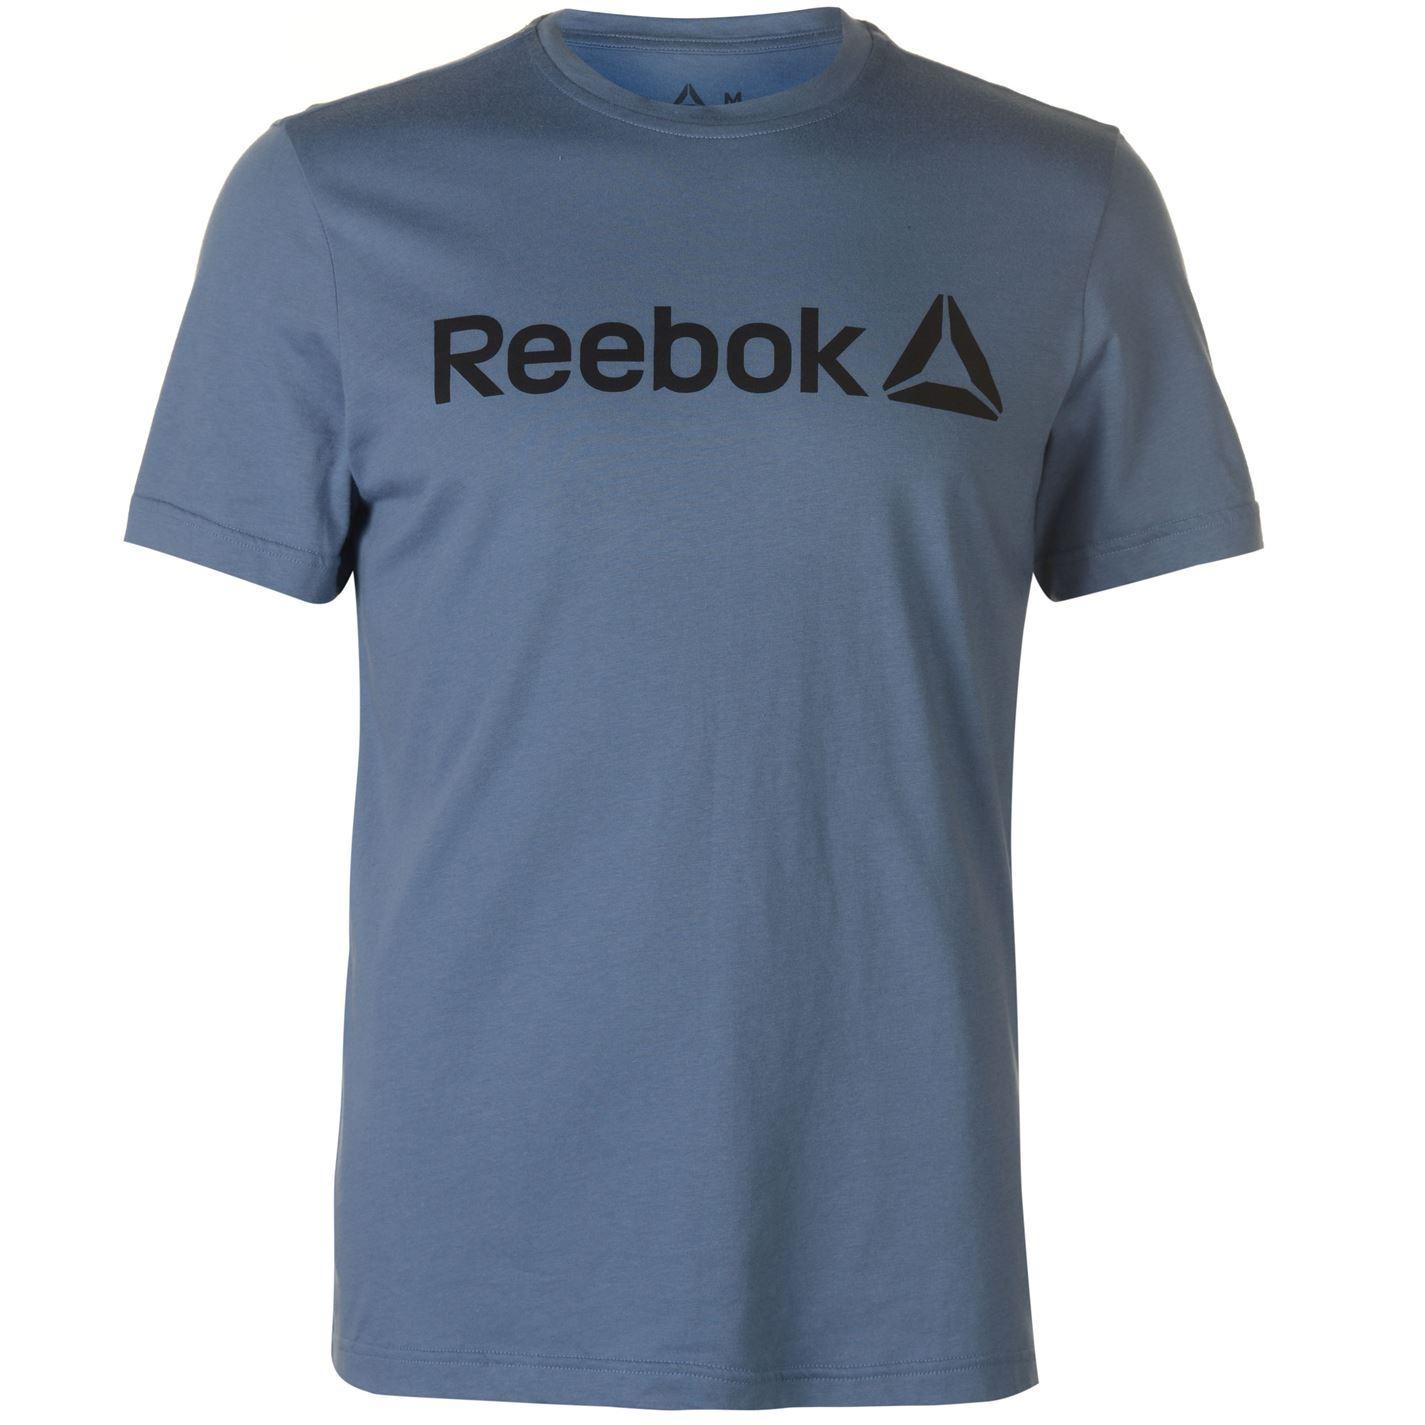 Reebok-Delta-Logo-T-Shirt-Mens-Tee-Shirt-Top thumbnail 16